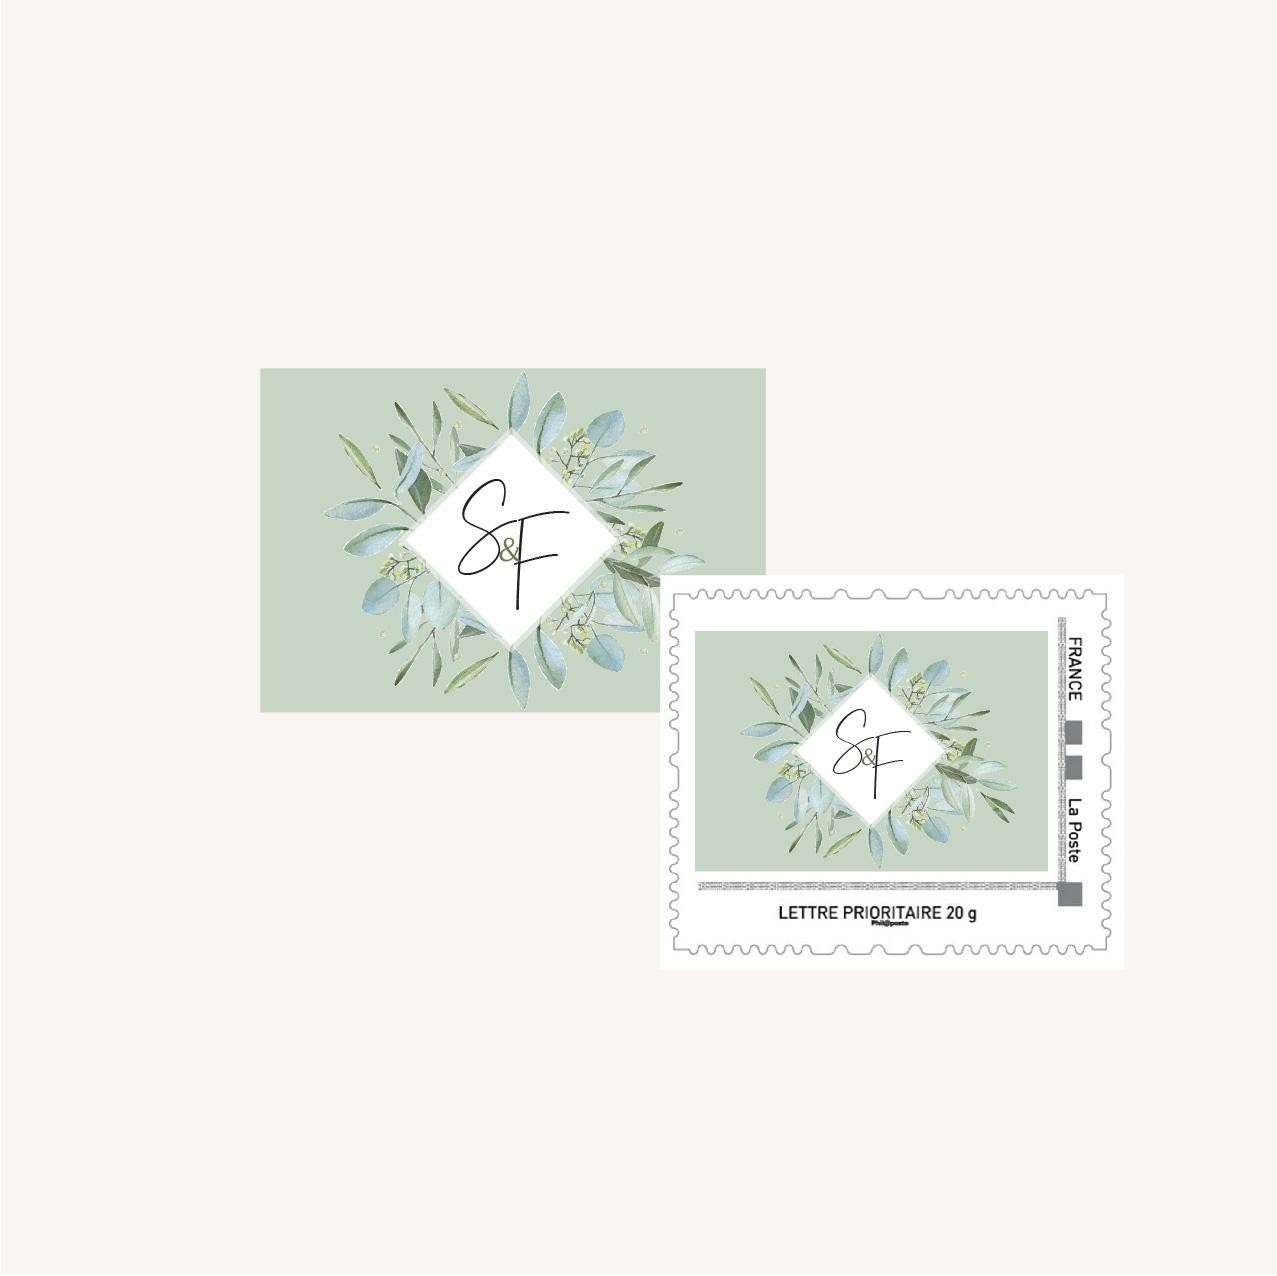 Timbre personnalisé mariage olivier nature blanc vert kraft